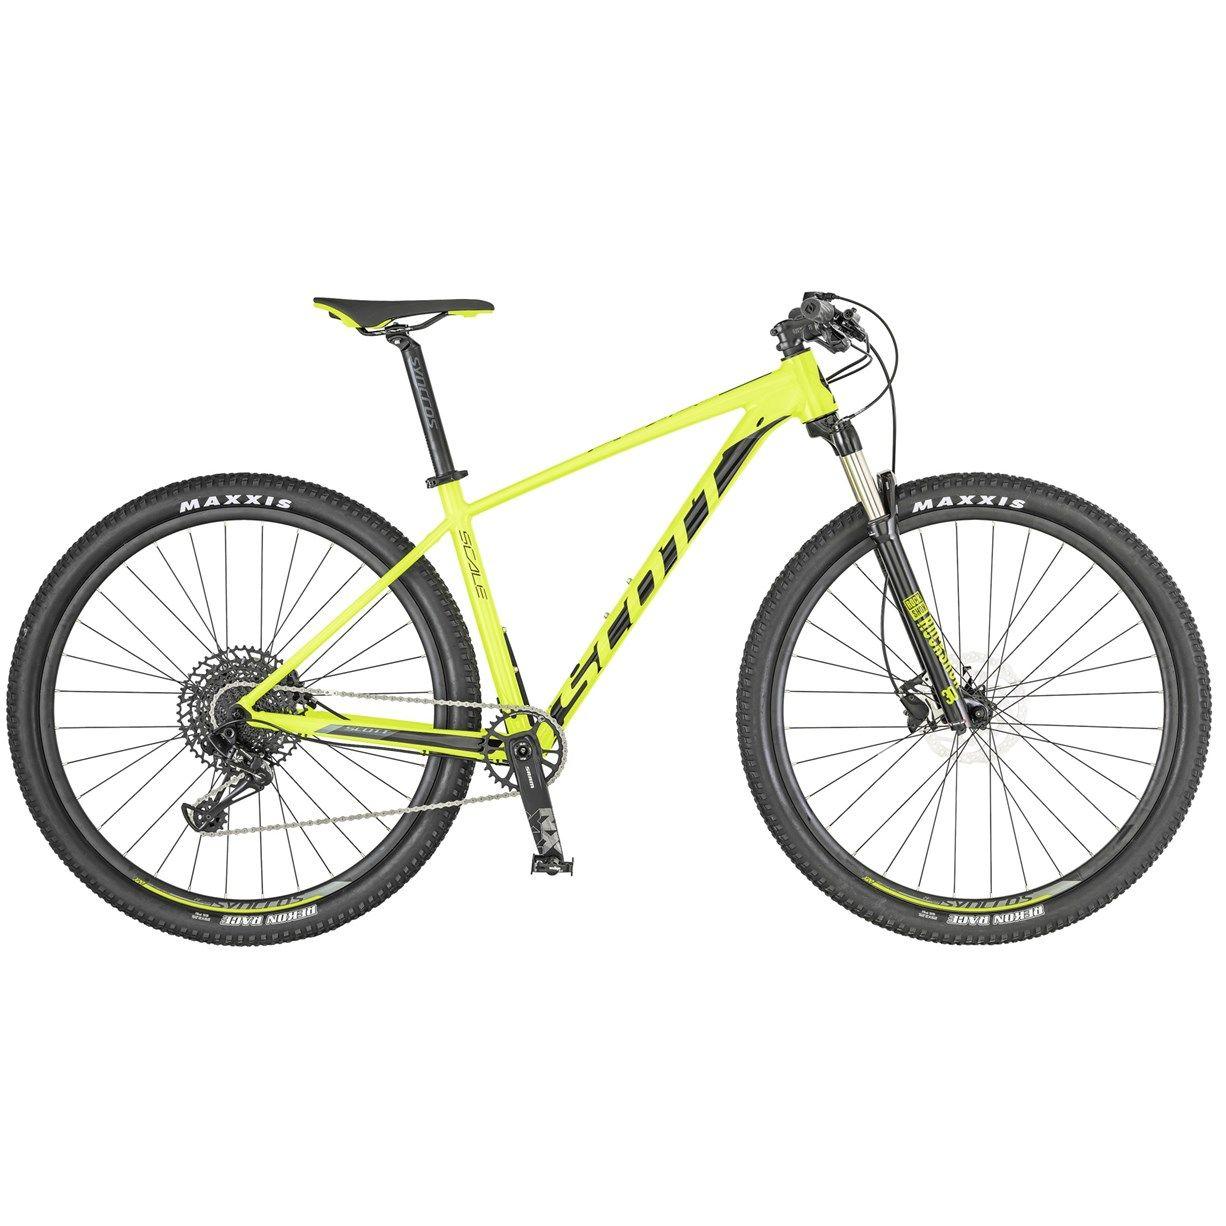 Scott Scale 980 2019 Hardtail Mountain Bike Yellow Black